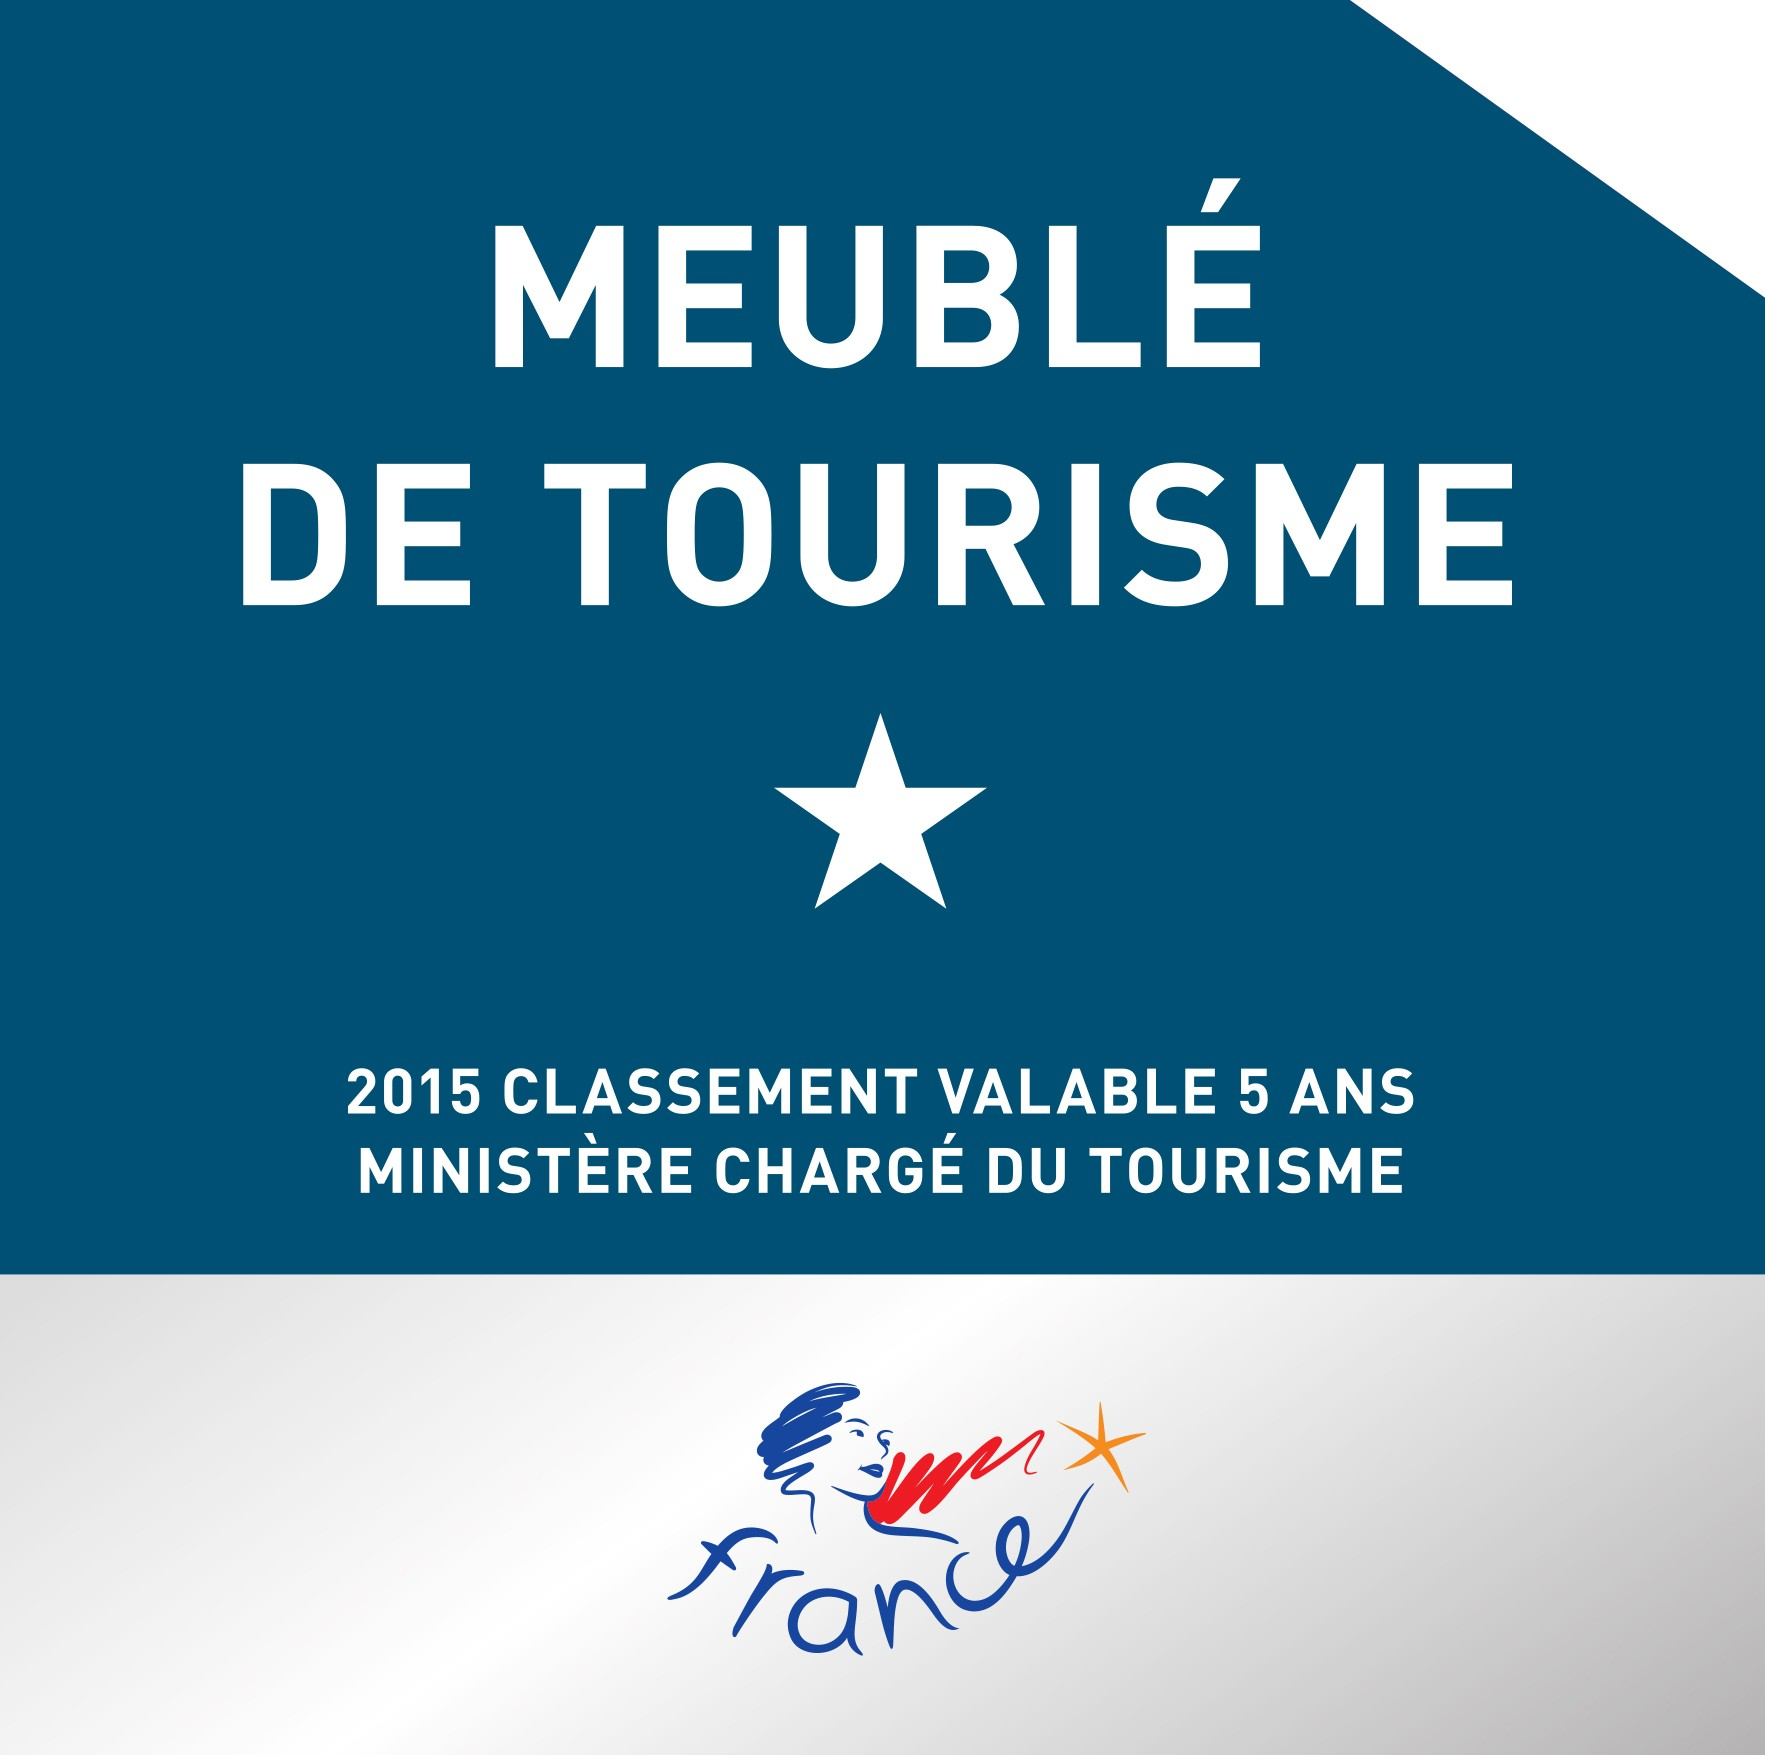 plaque-meuble-tourisme1-2015-11616